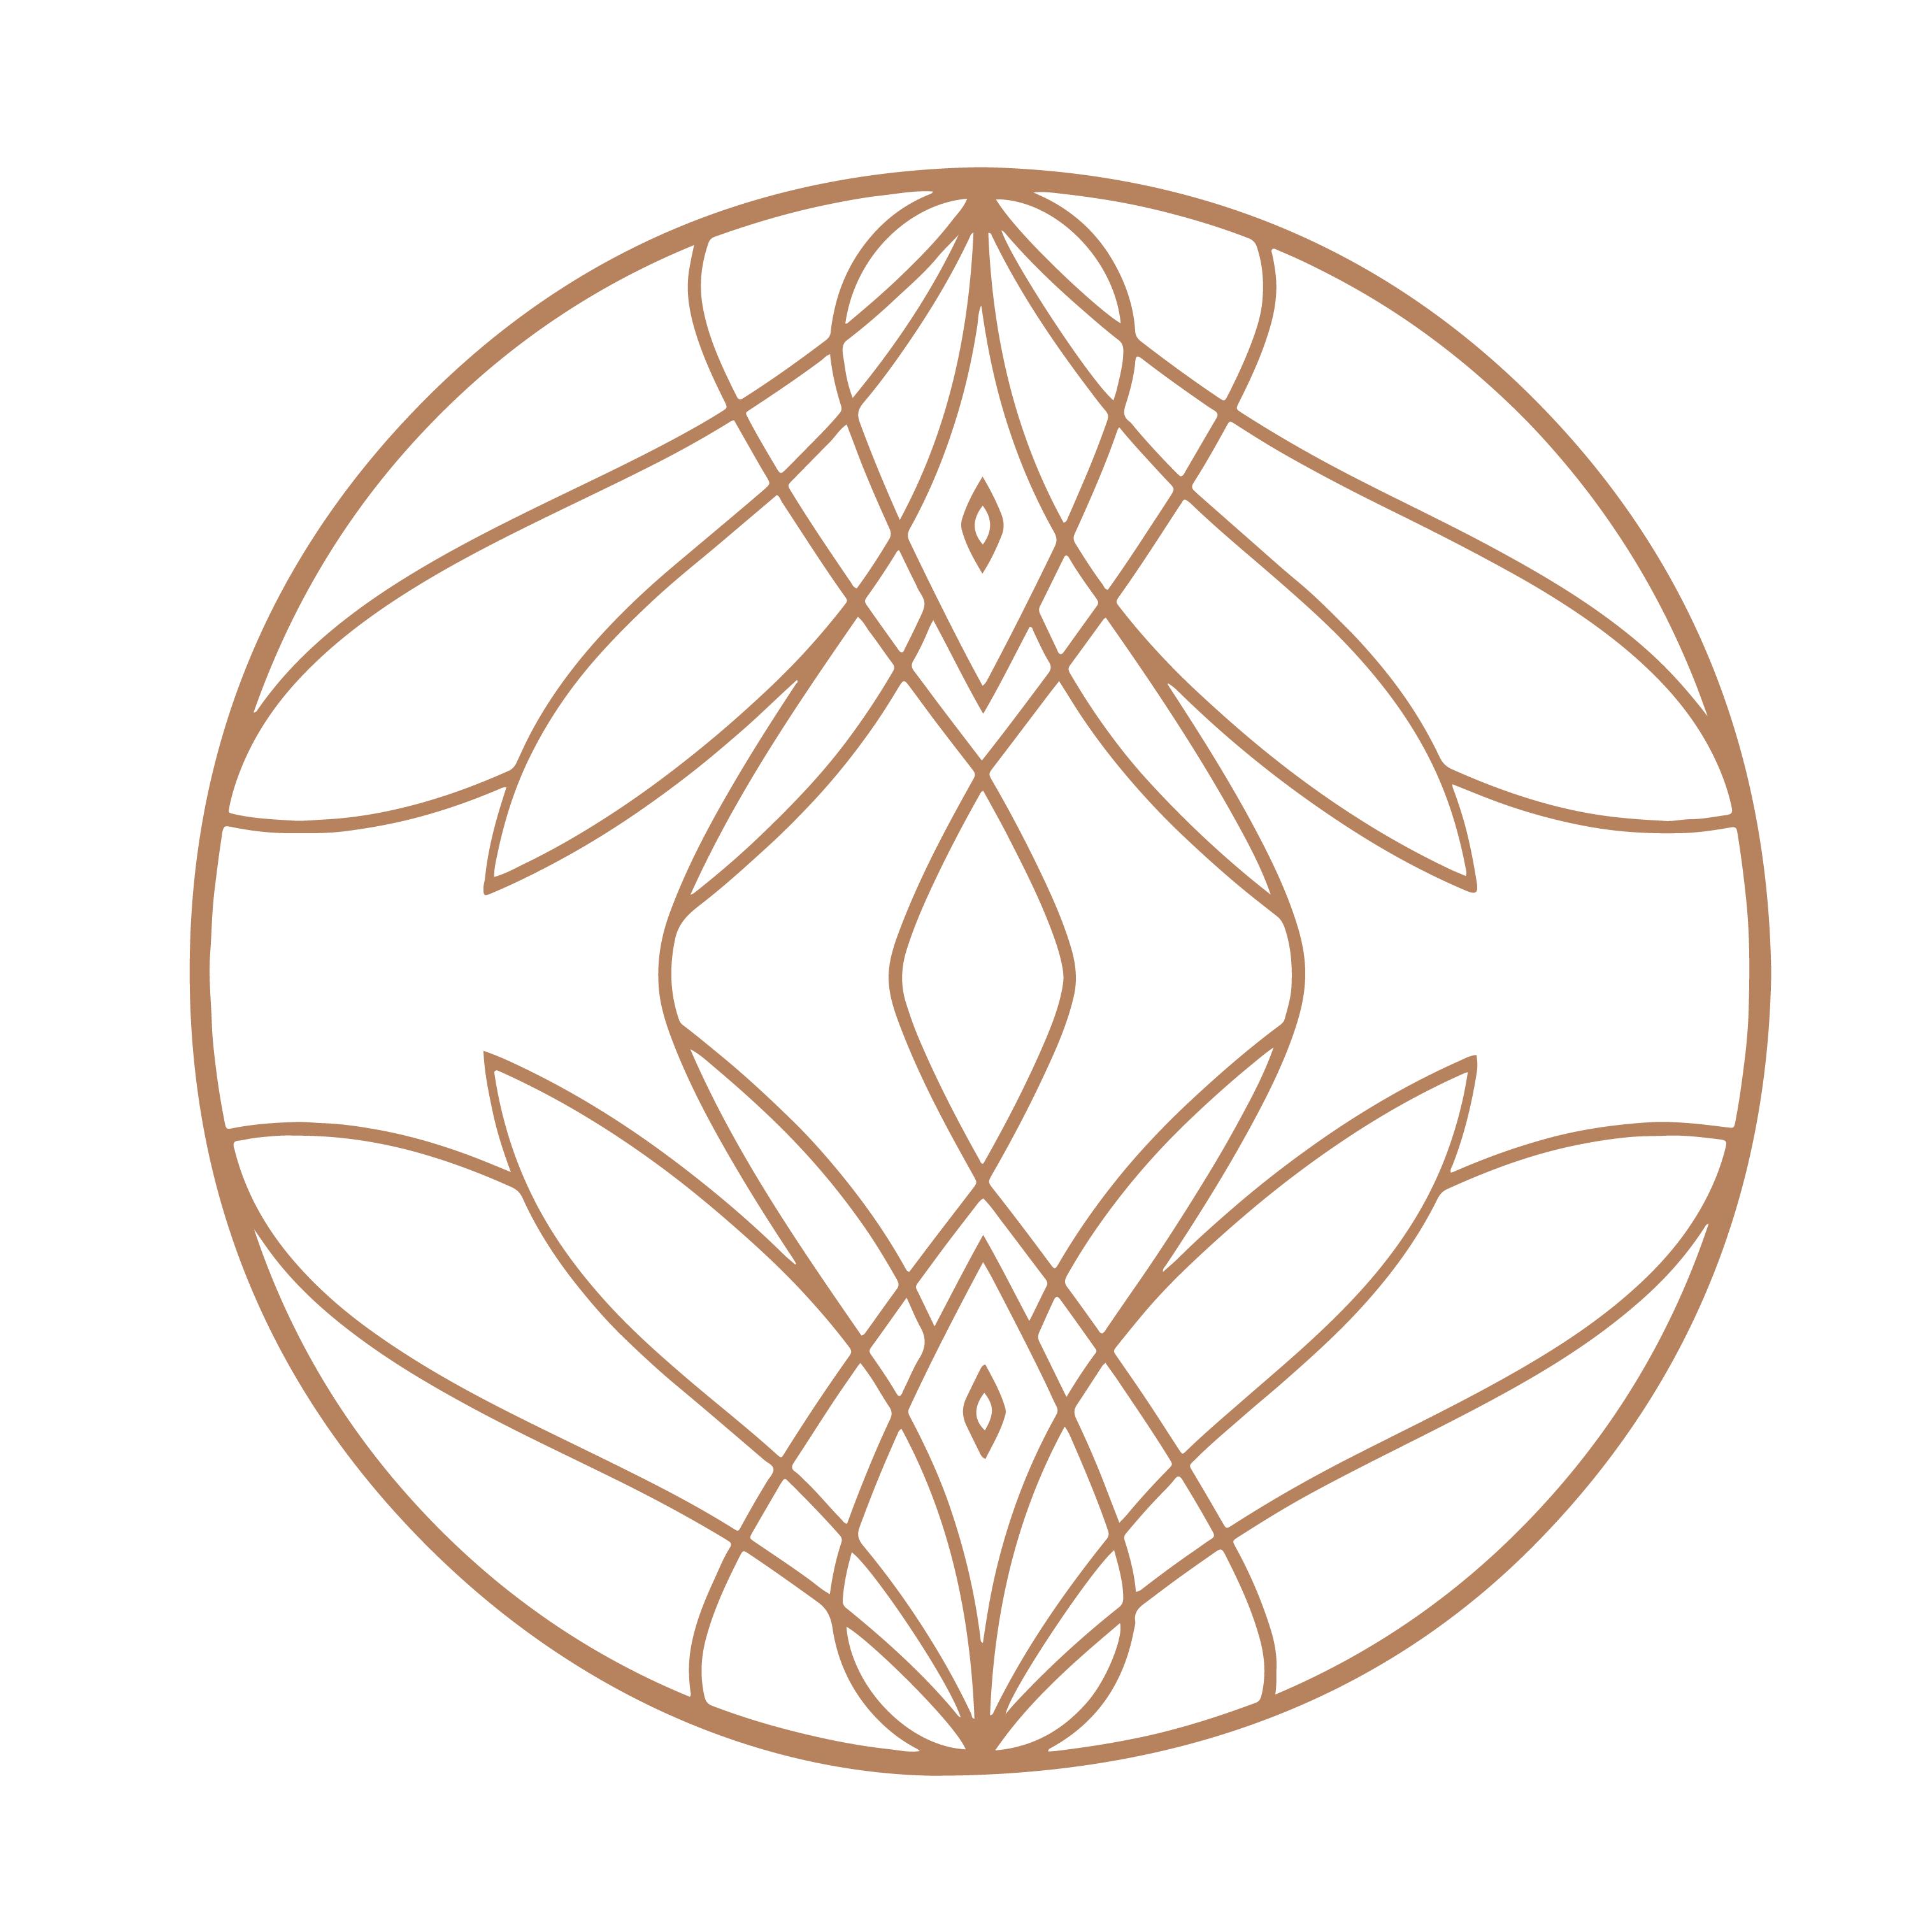 THE PALLAS | Kundalini Yoga (thepallas) Profile Image | Linktree